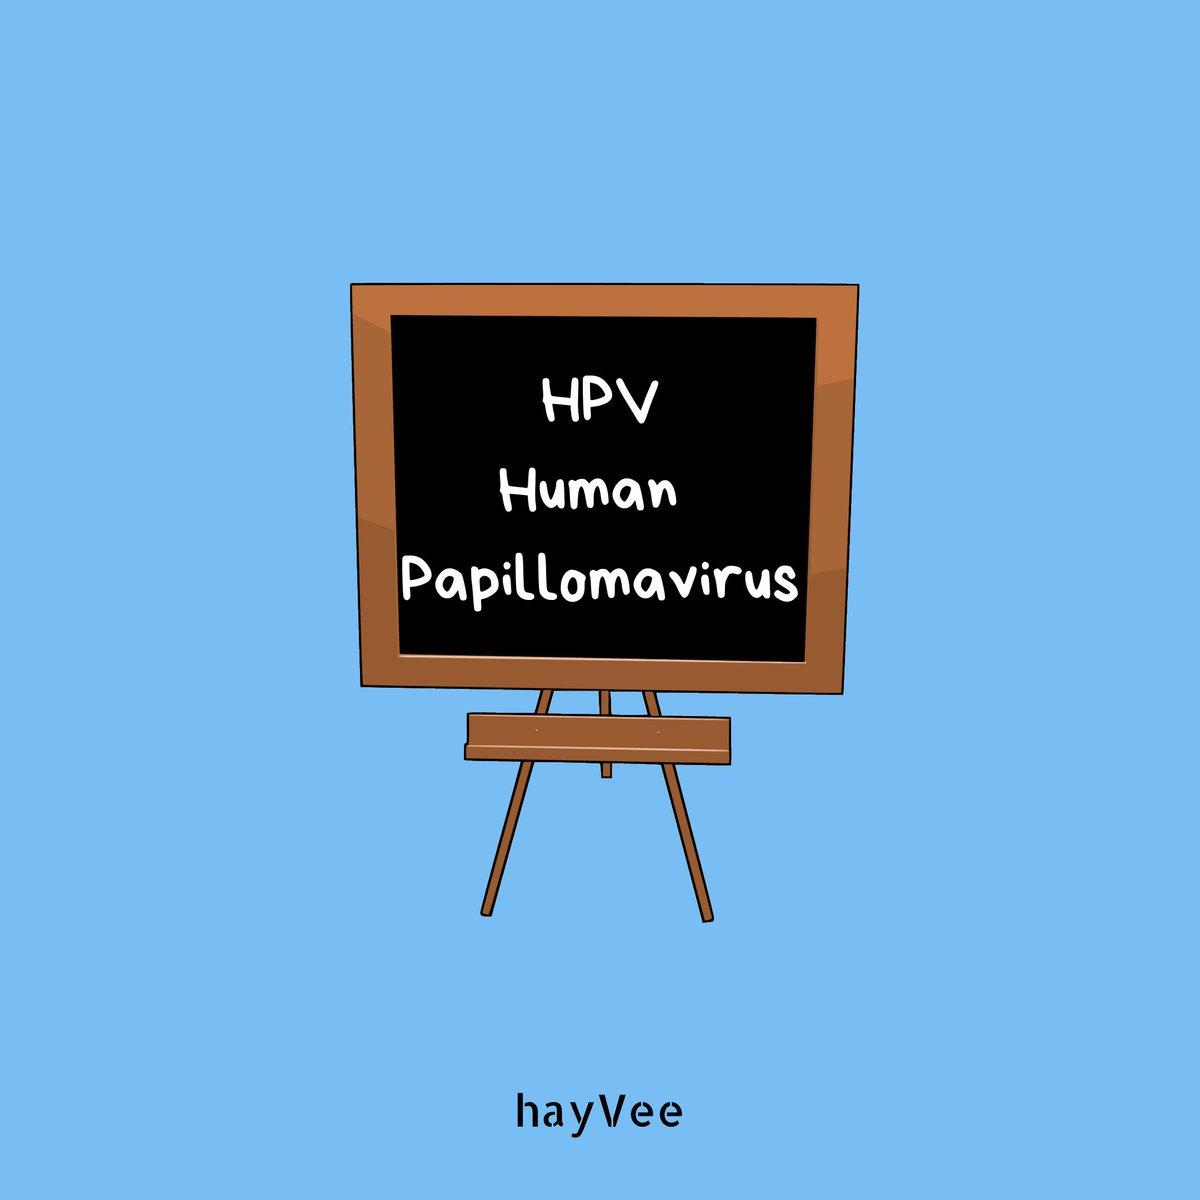 papillomavirus herpes genital